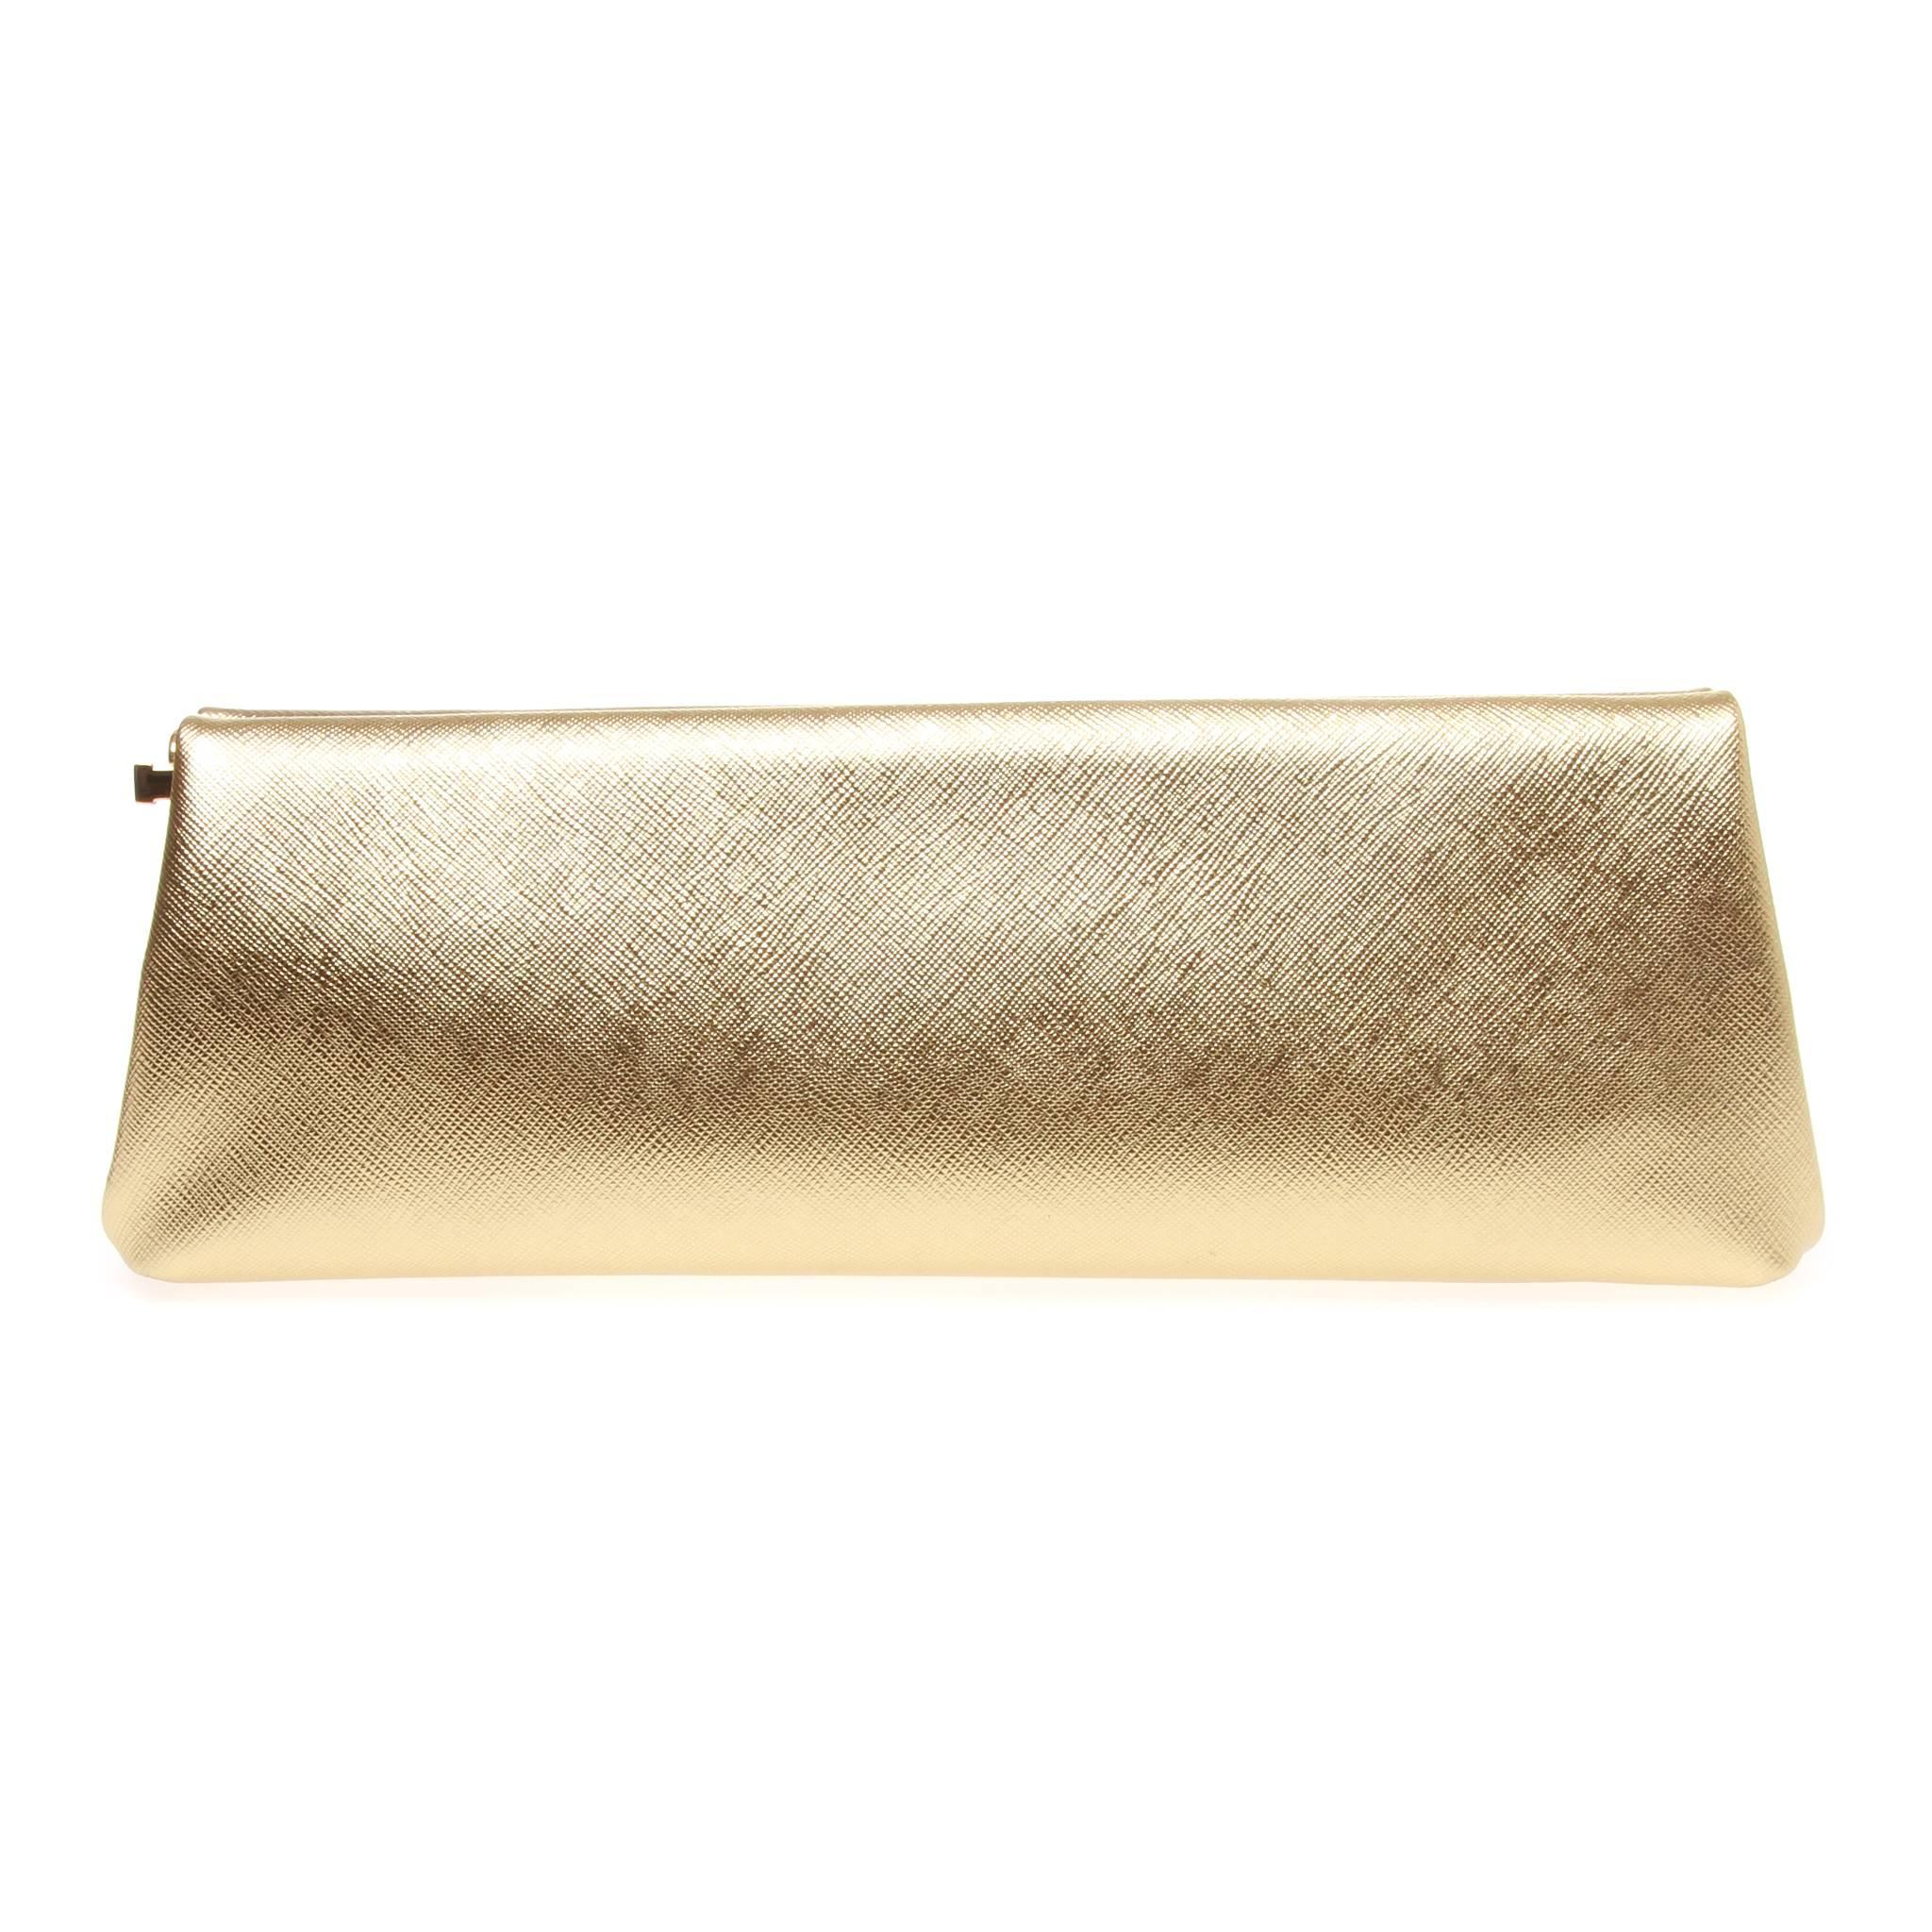 1stdibs Prada Saffiano Gold Metallic Lux Frame Clutch 1DABQPp